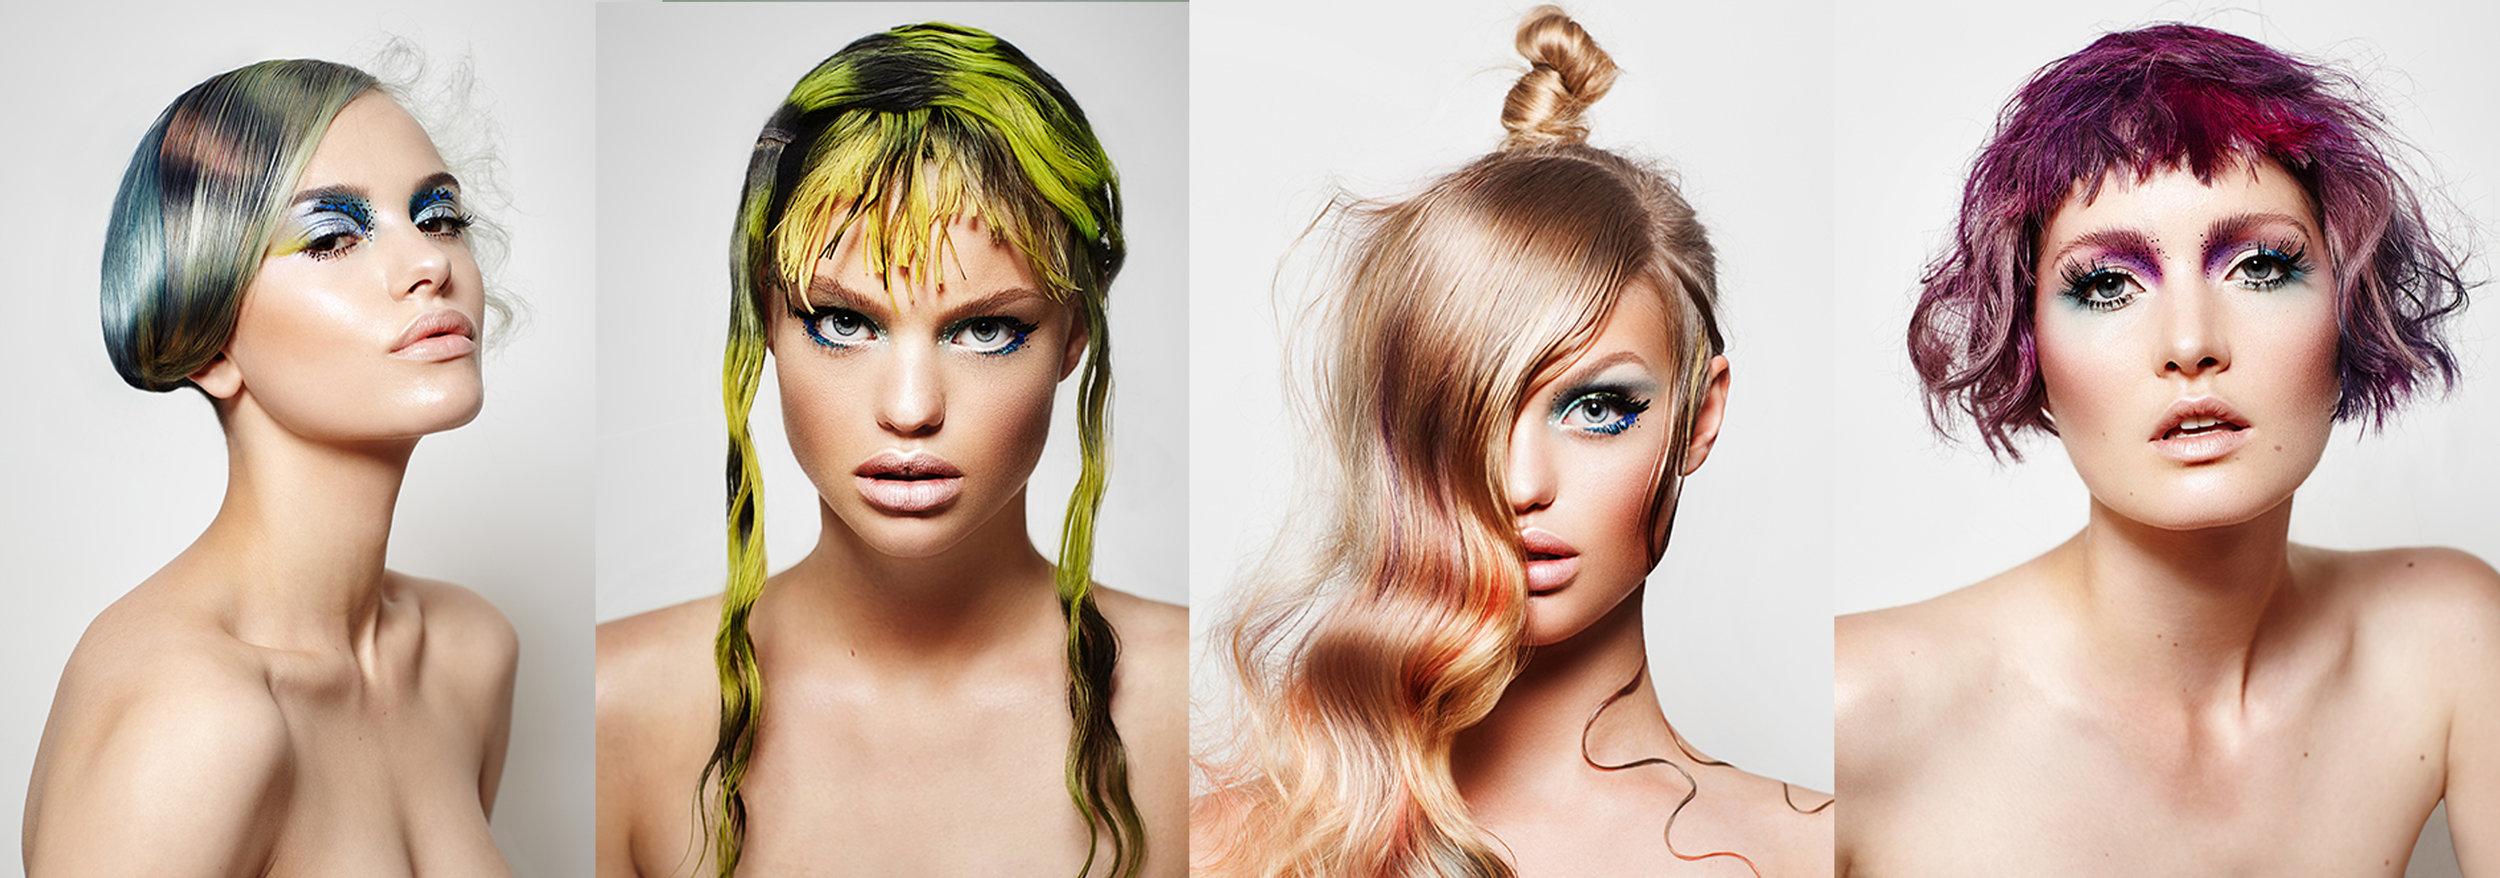 friseur hairdresser editorial grooming shooting wien vienna 1060 bester innovativ pulp riot olaplex maria nila vegan.jpg